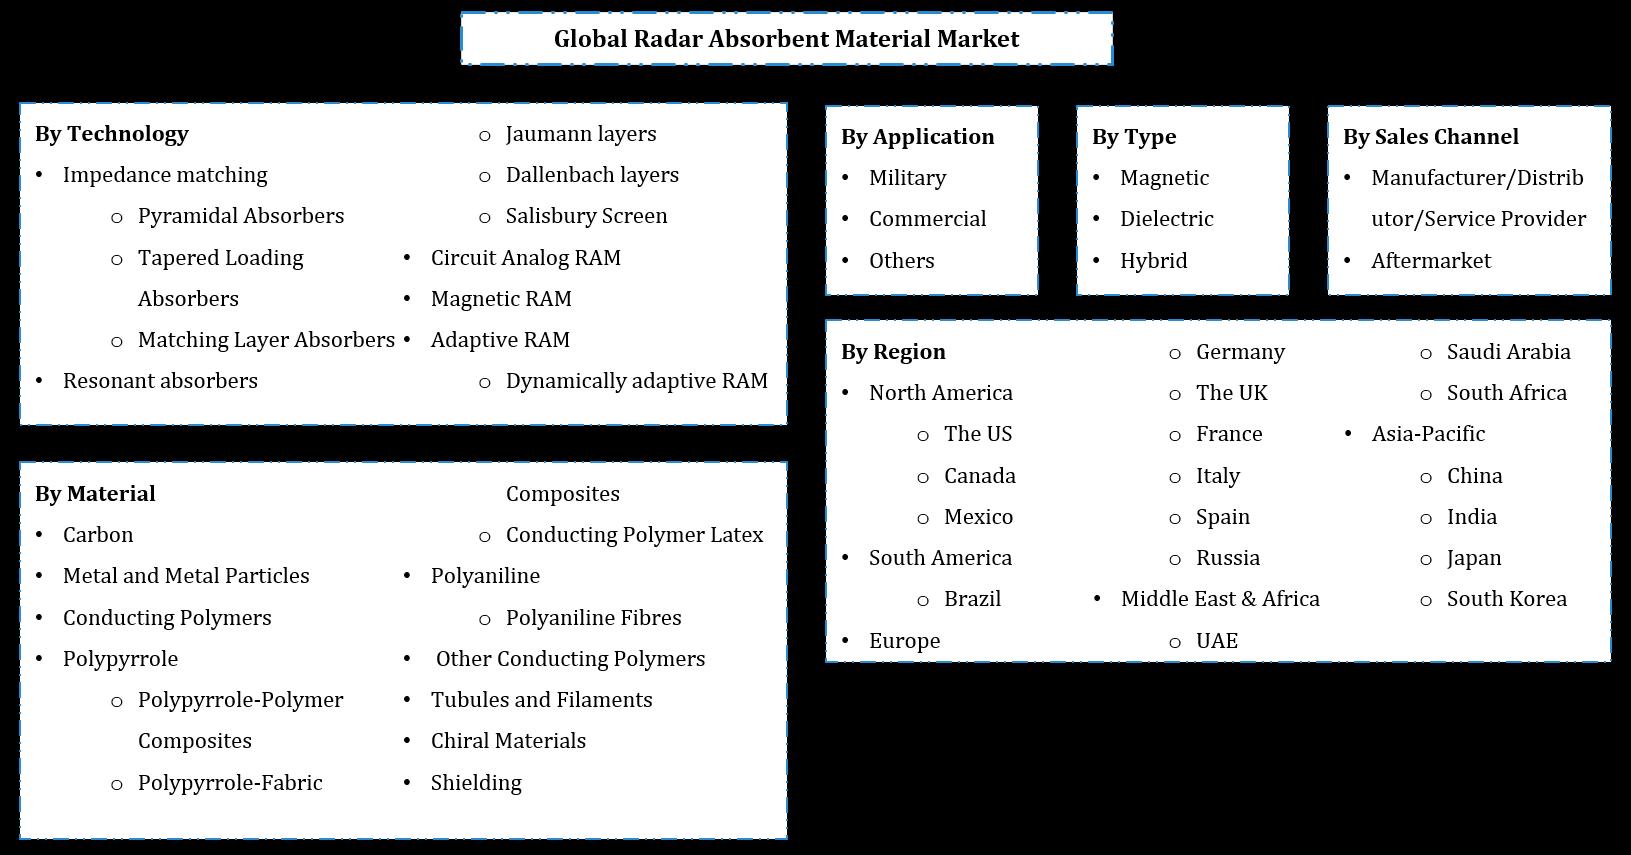 Global Radar Absorbent Material Market Segmentation